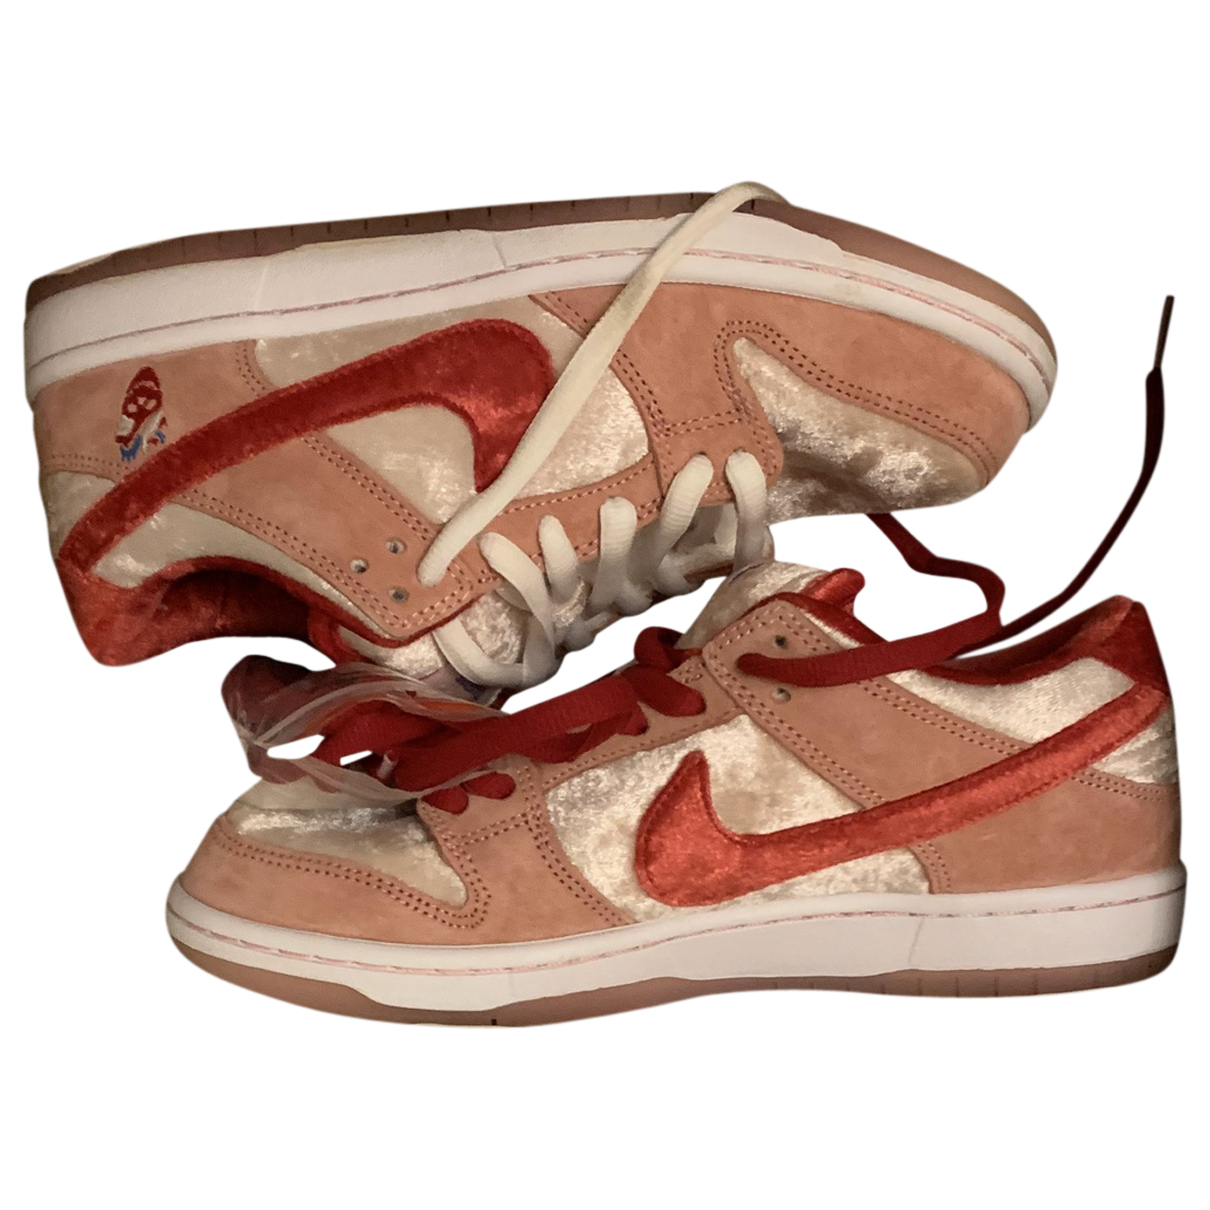 Deportivas SB Dunk  Nike